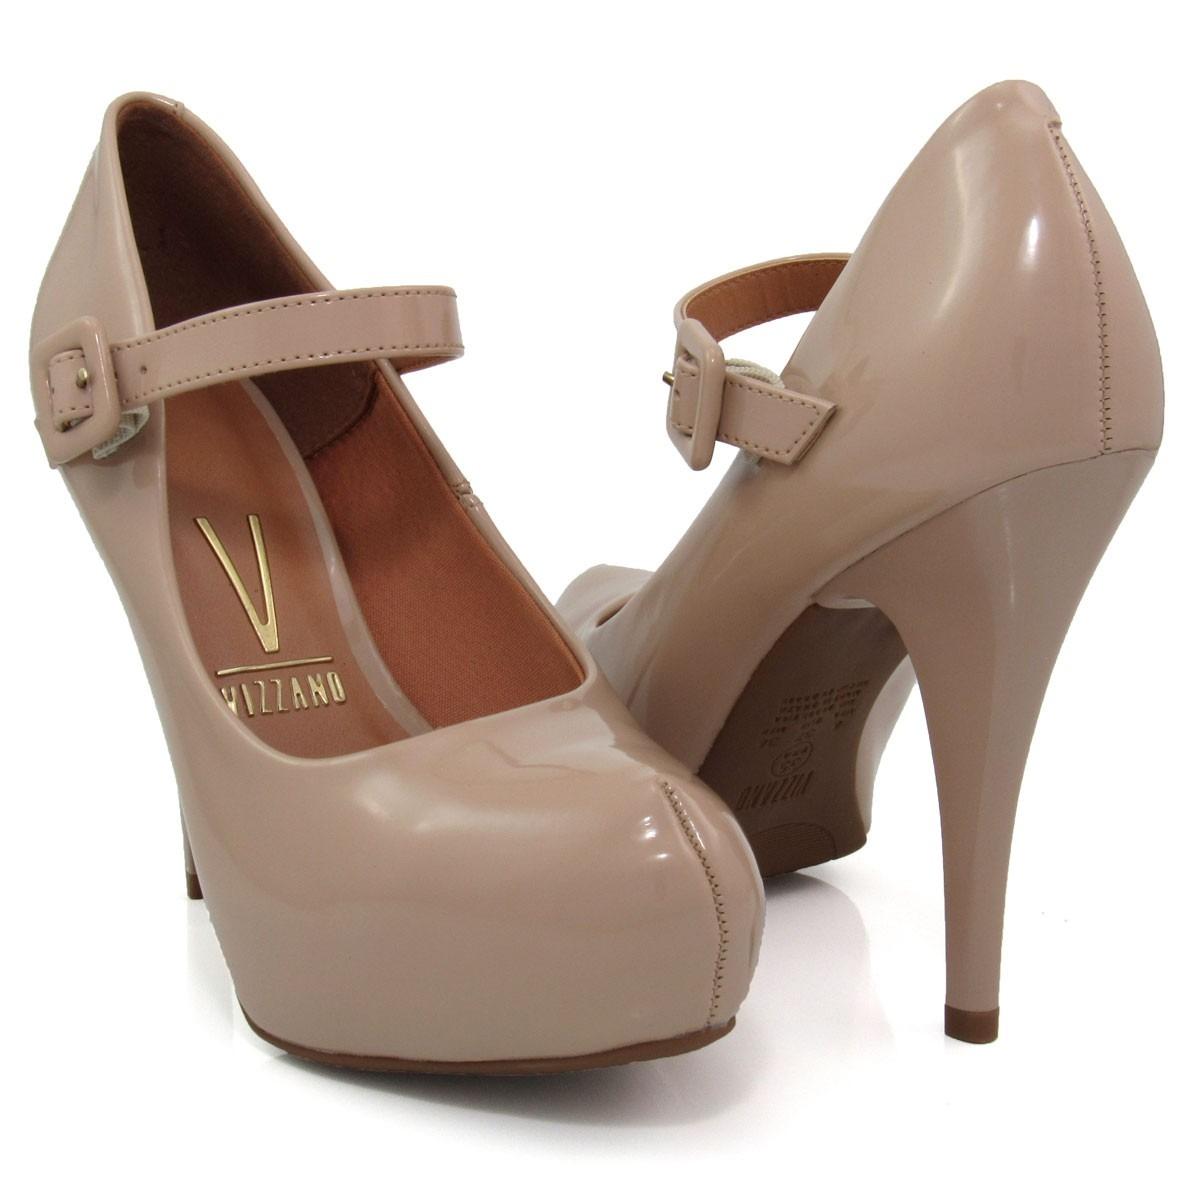 b38cd08d5 Sapato Feminino Scarpin Vizzano 1143304 Boneca Verniz - R$ 115,00 em ...